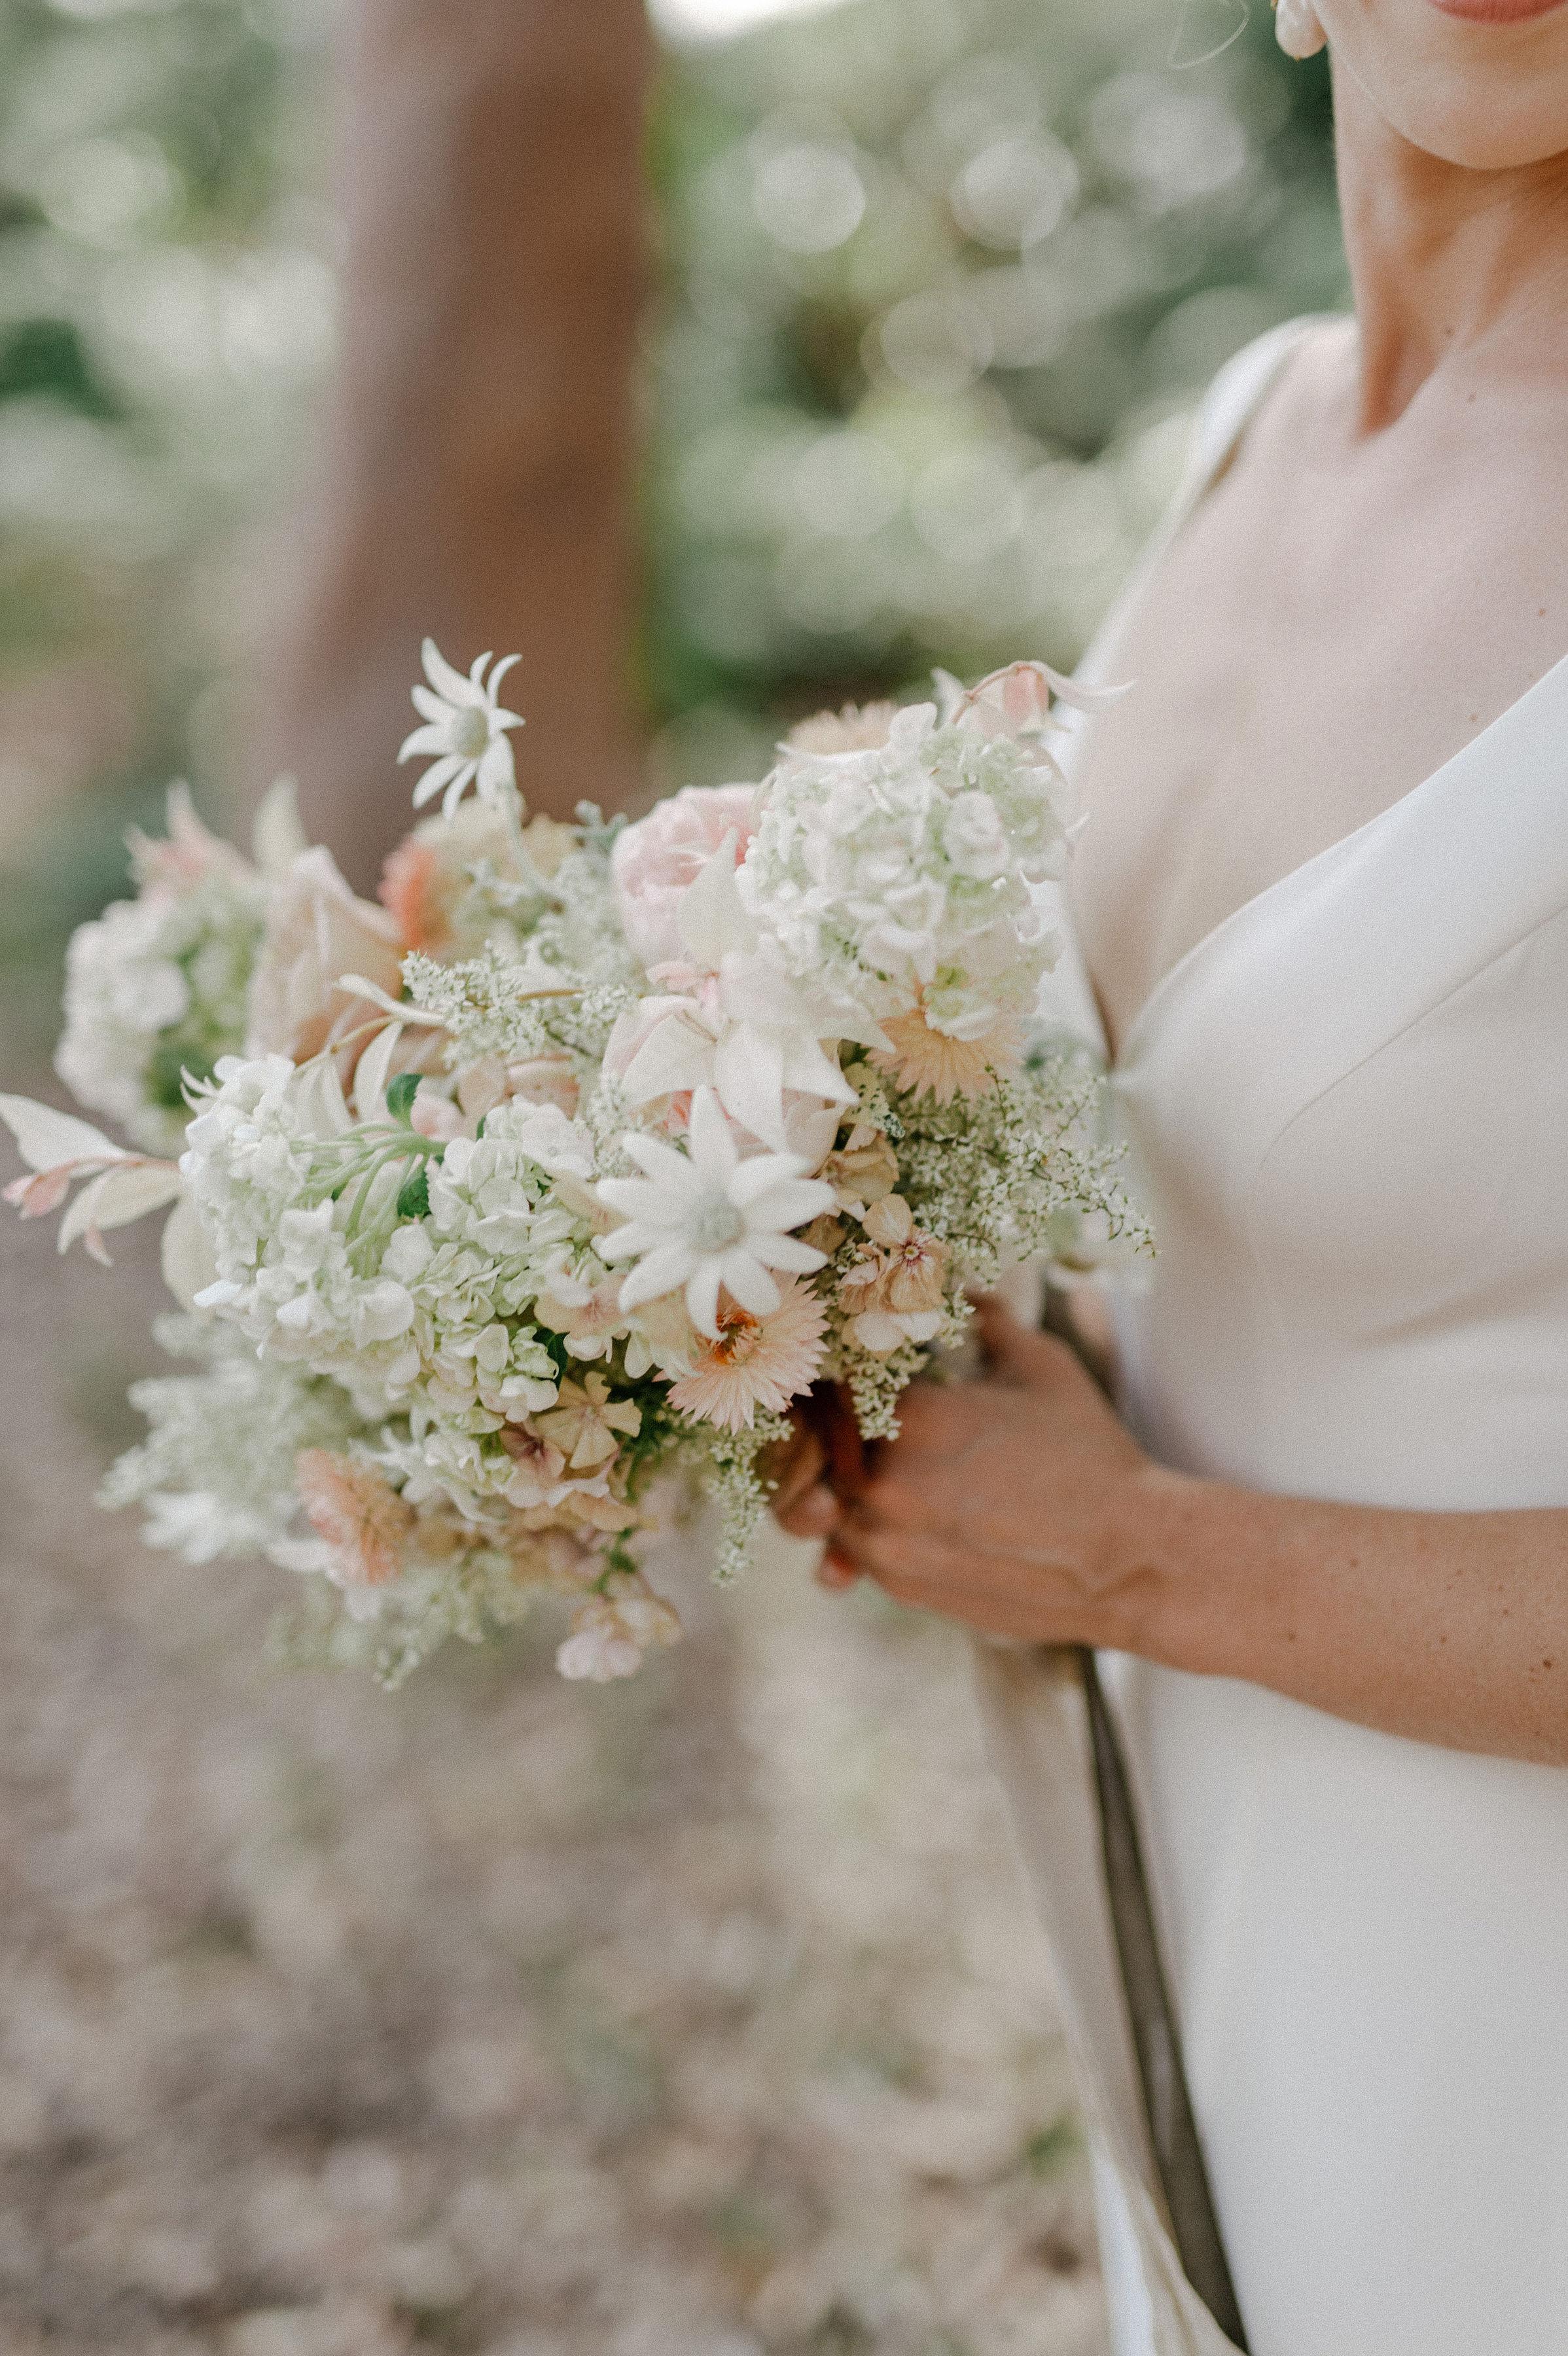 Romantic australian beach wedding. Textural and natural wedding flowers. Soft white bridal bouquet